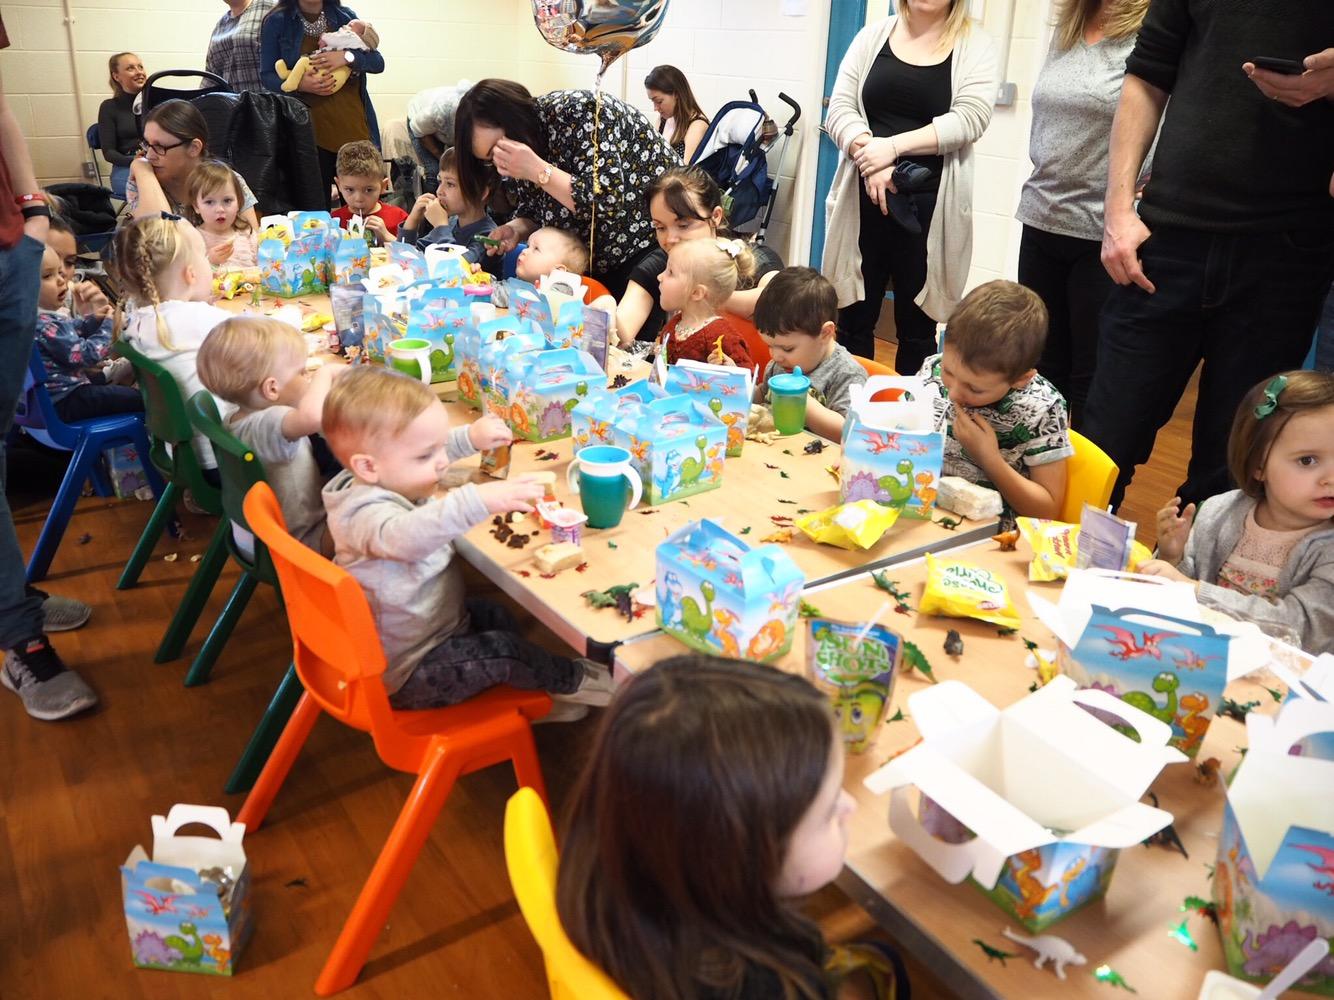 mummy blog, boys birthday party ideas, dinosaur party ideas, messy play parties